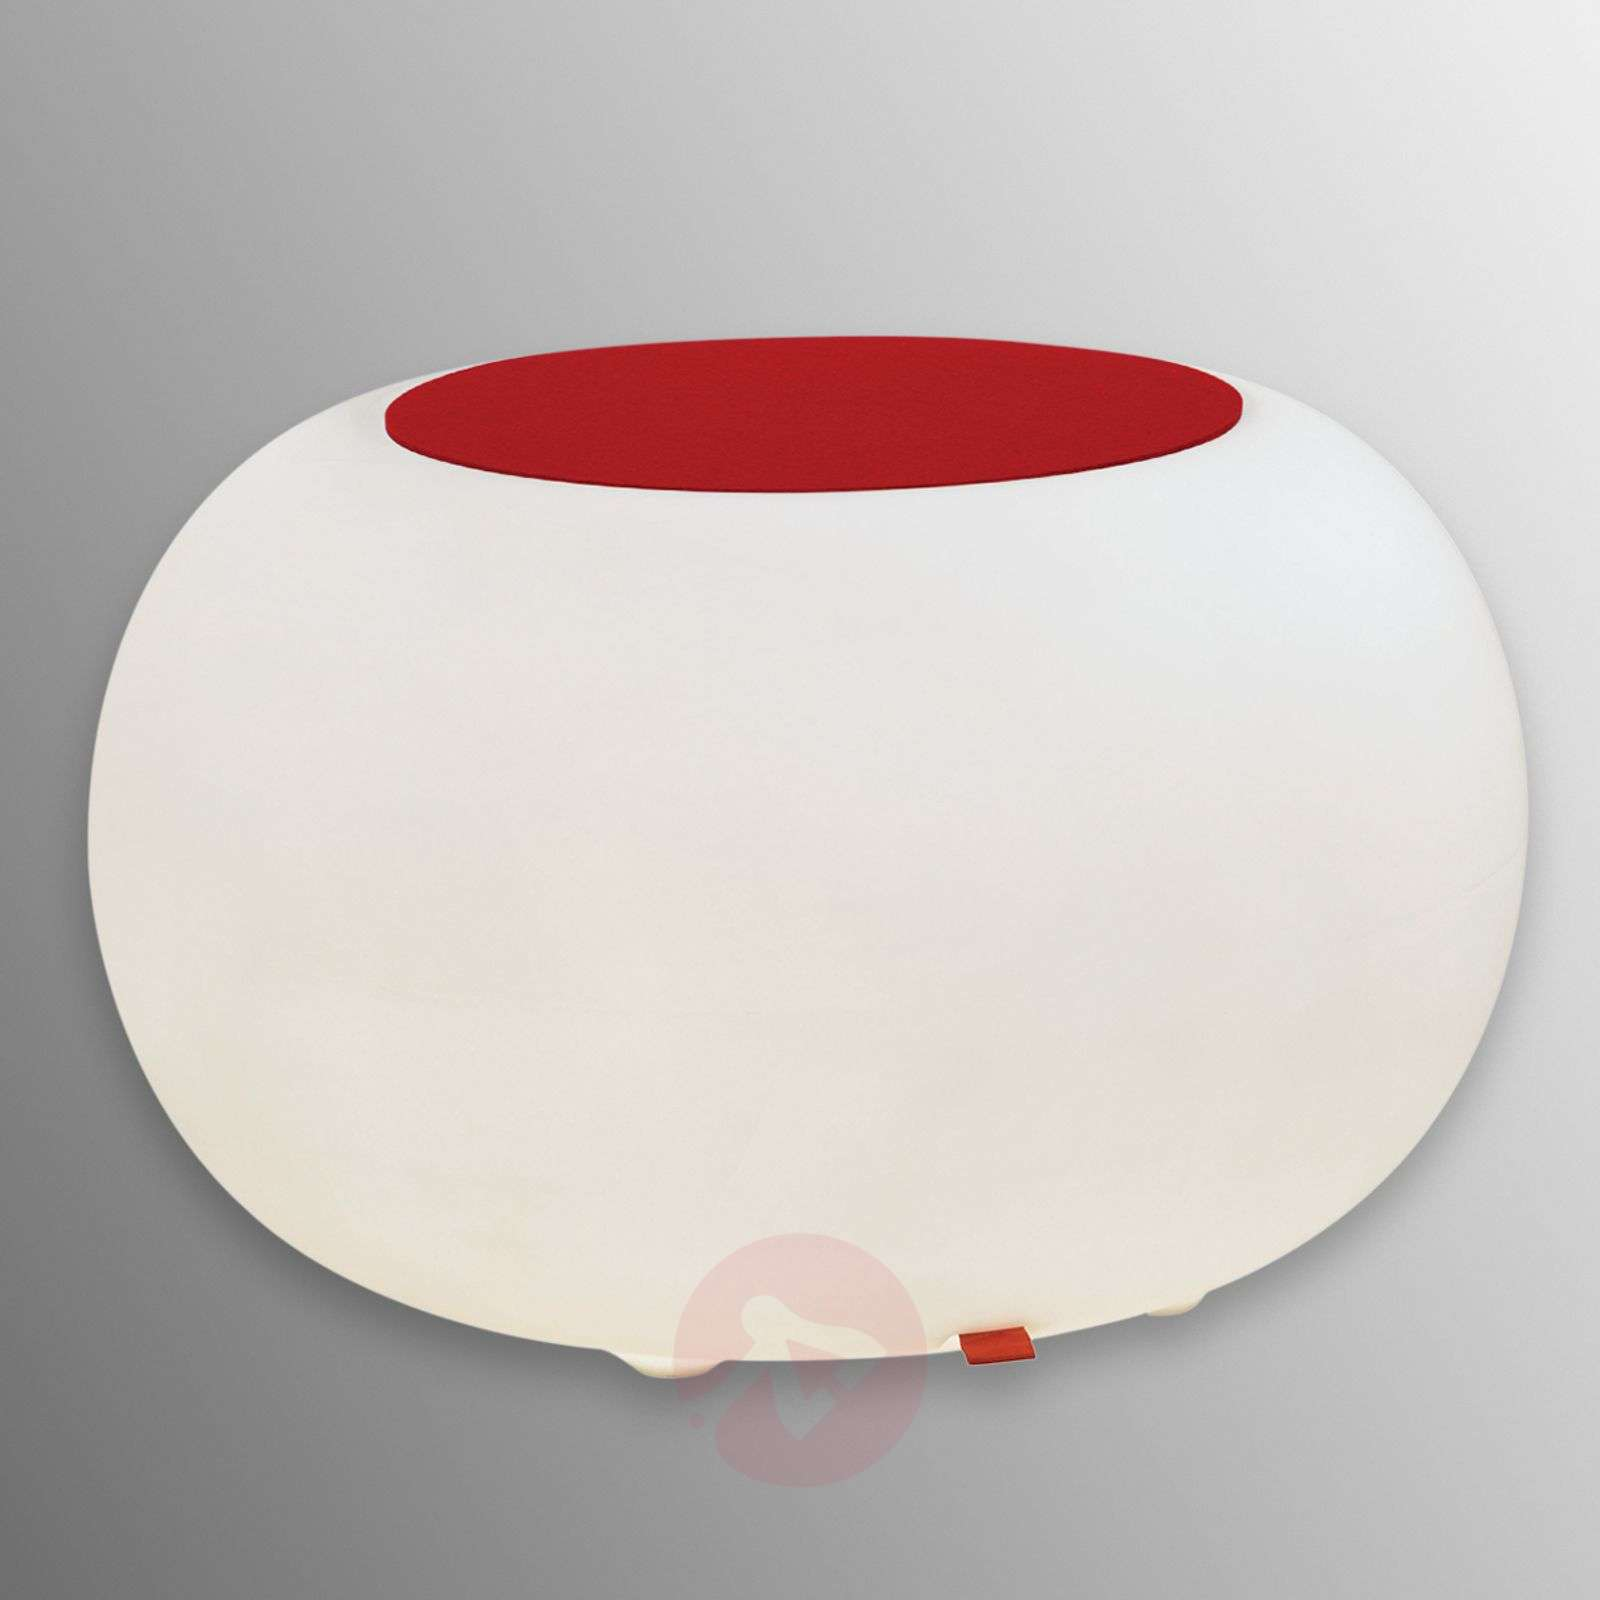 Table BUBBLE Indoor LED white light + red felt-6537054-01